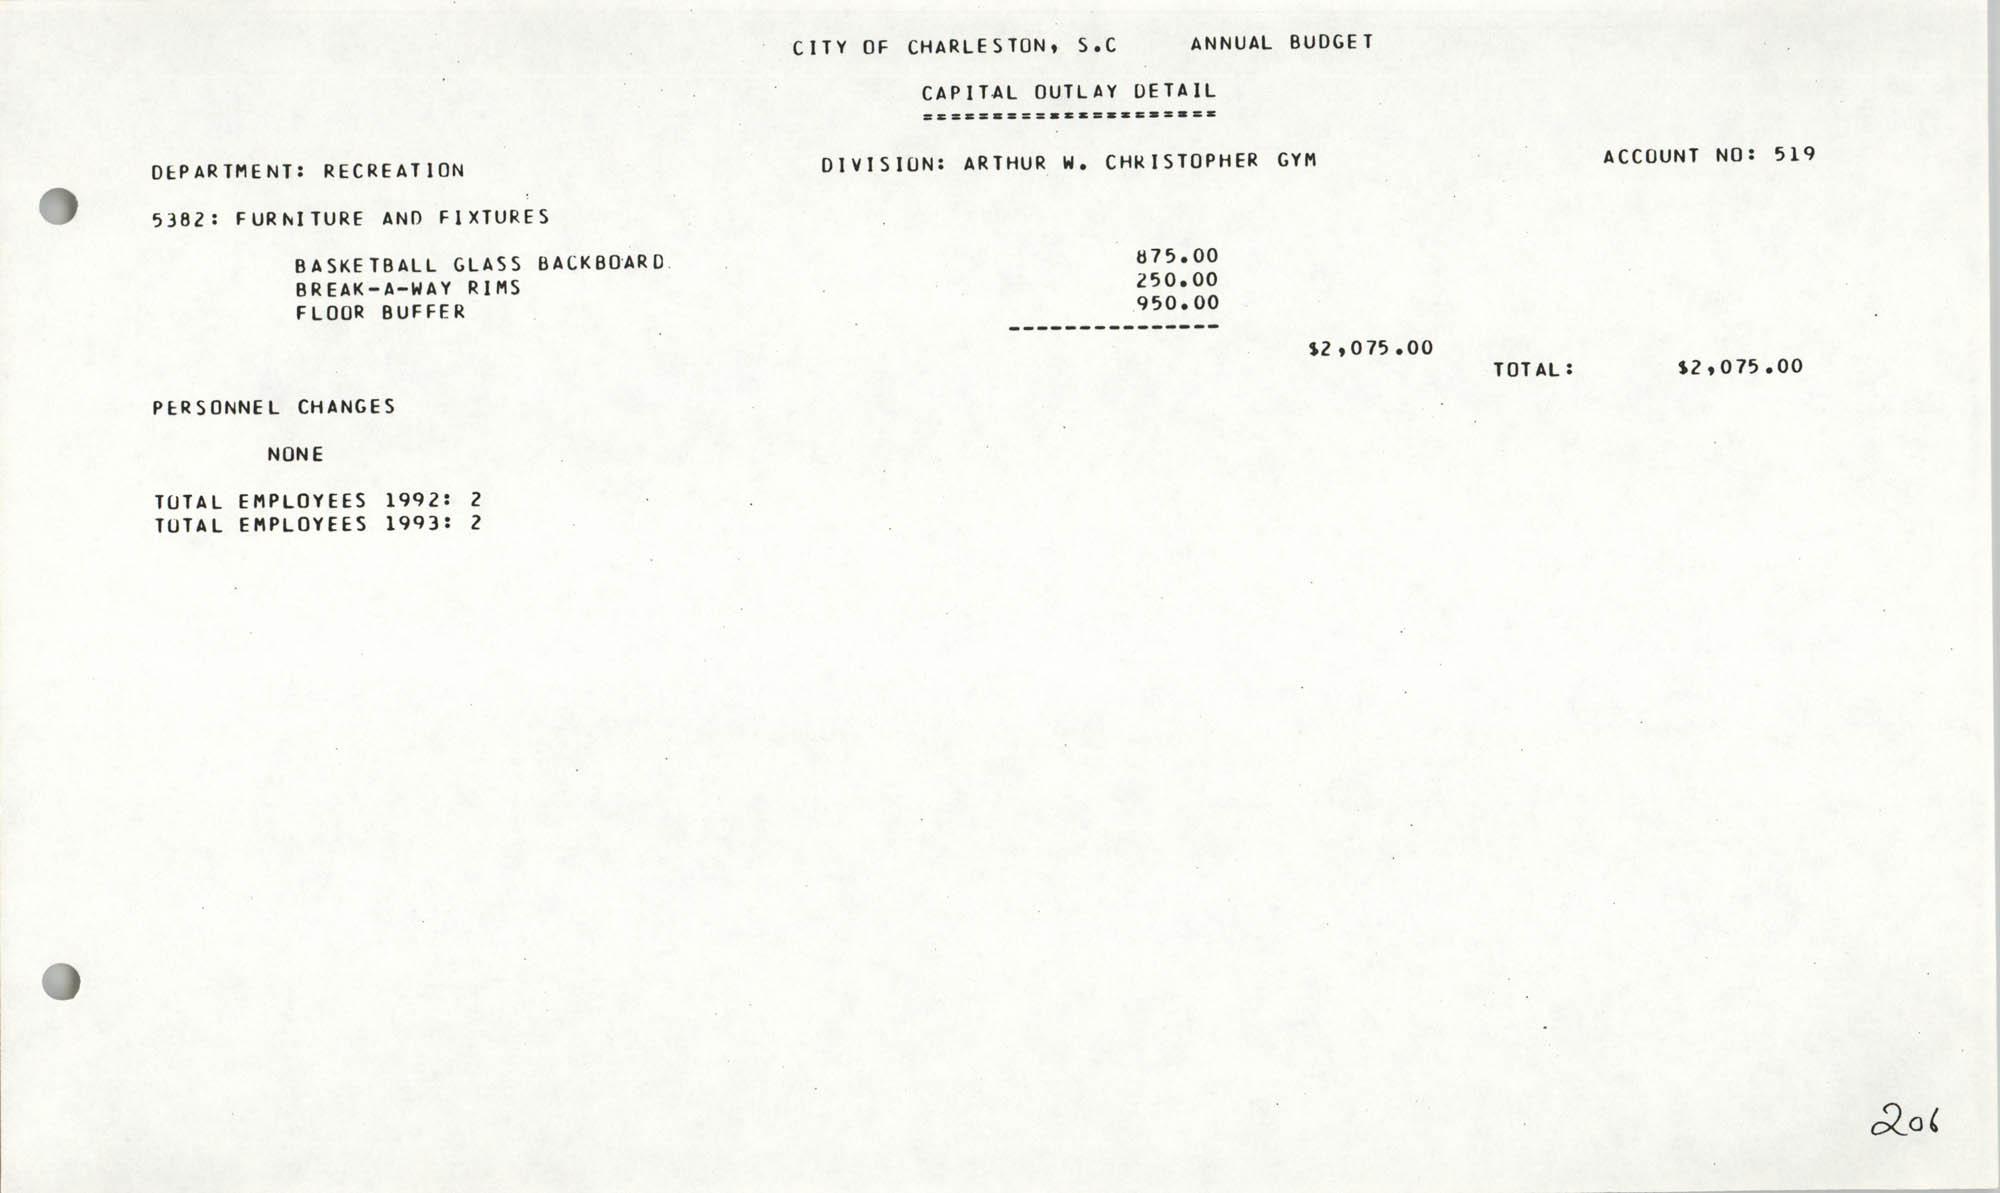 The City Council of Charleston, South Carolina, 1993 Budget, Page 206